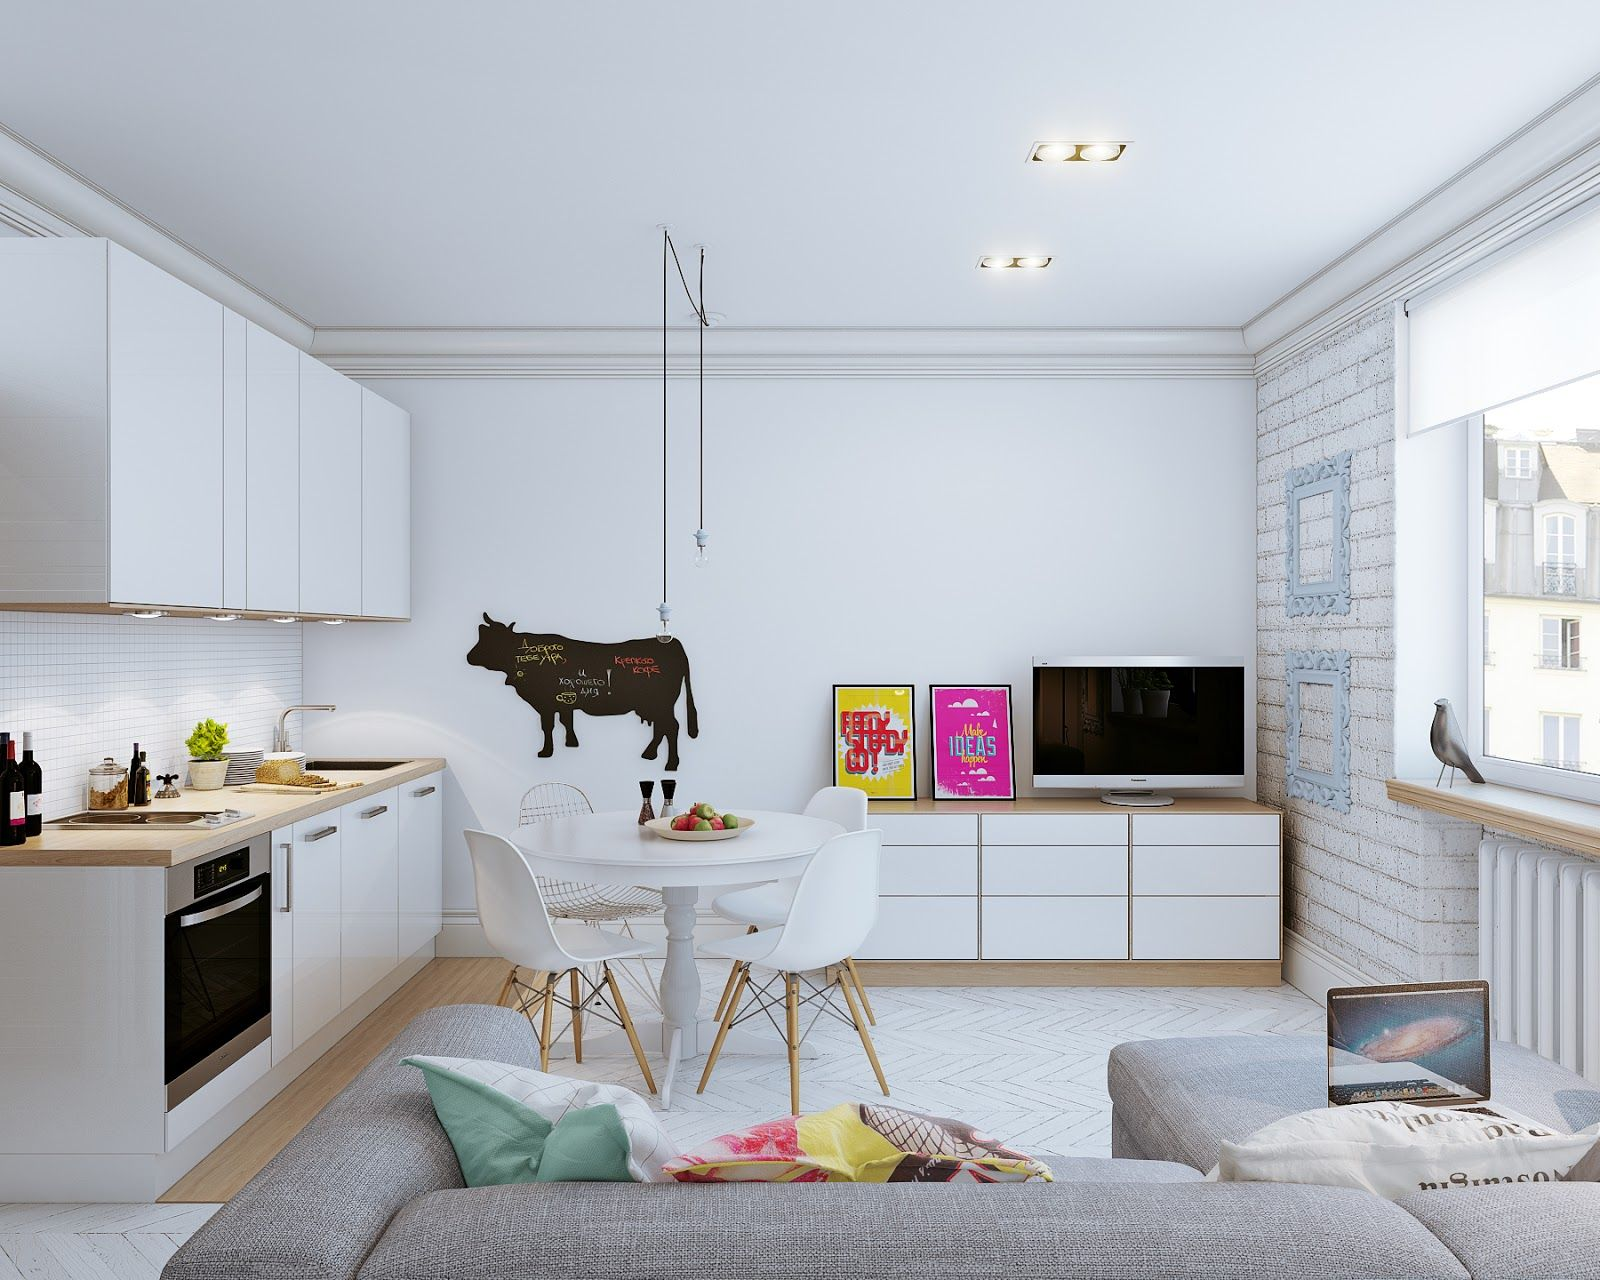 Bright scandinavian style in a modern apartment home interior design - Bright Spot In The Scandinavian Interior Design Style Of The Modern Kitchen